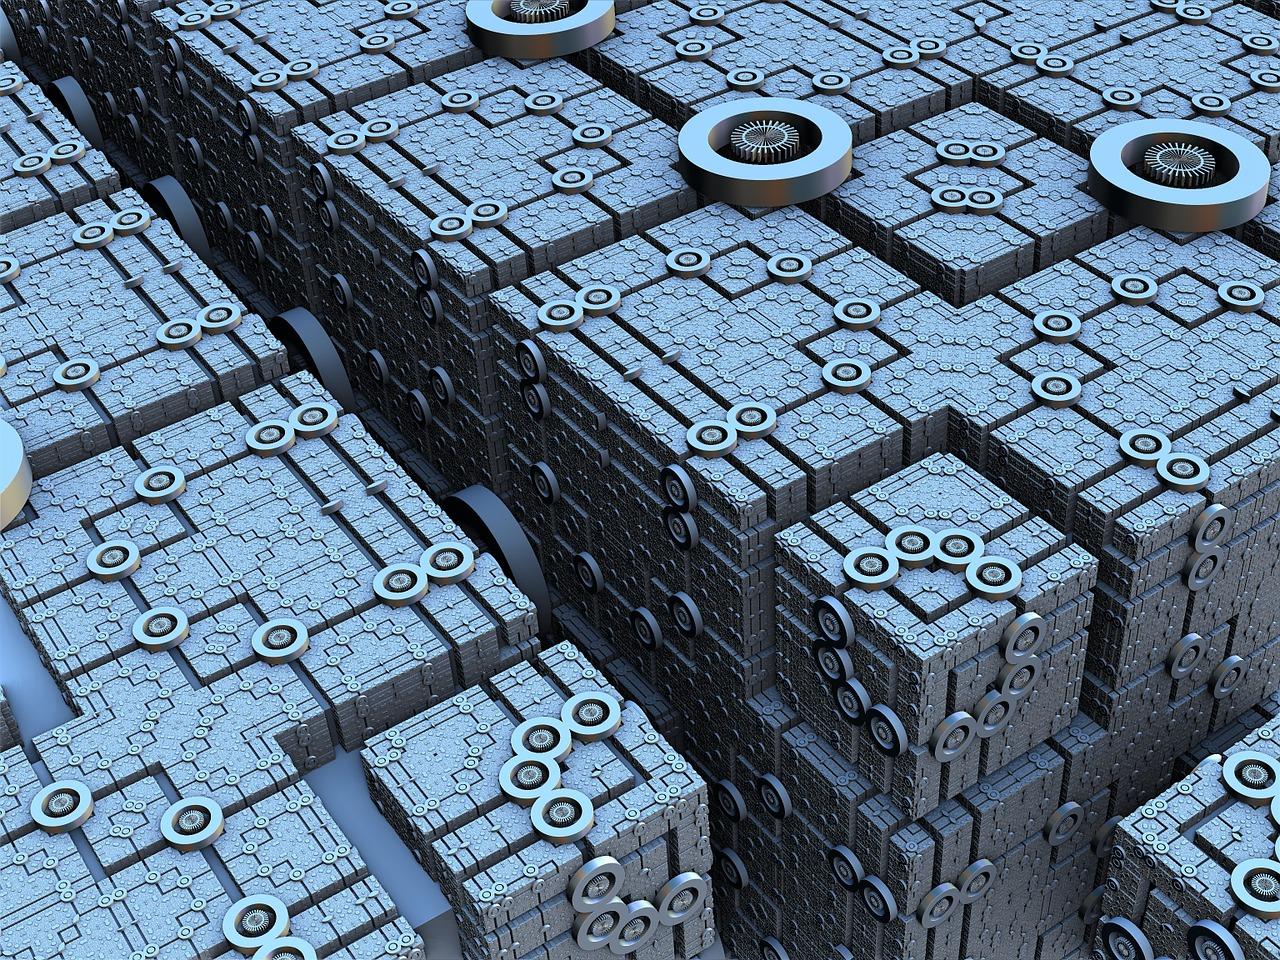 grid-871475_1280